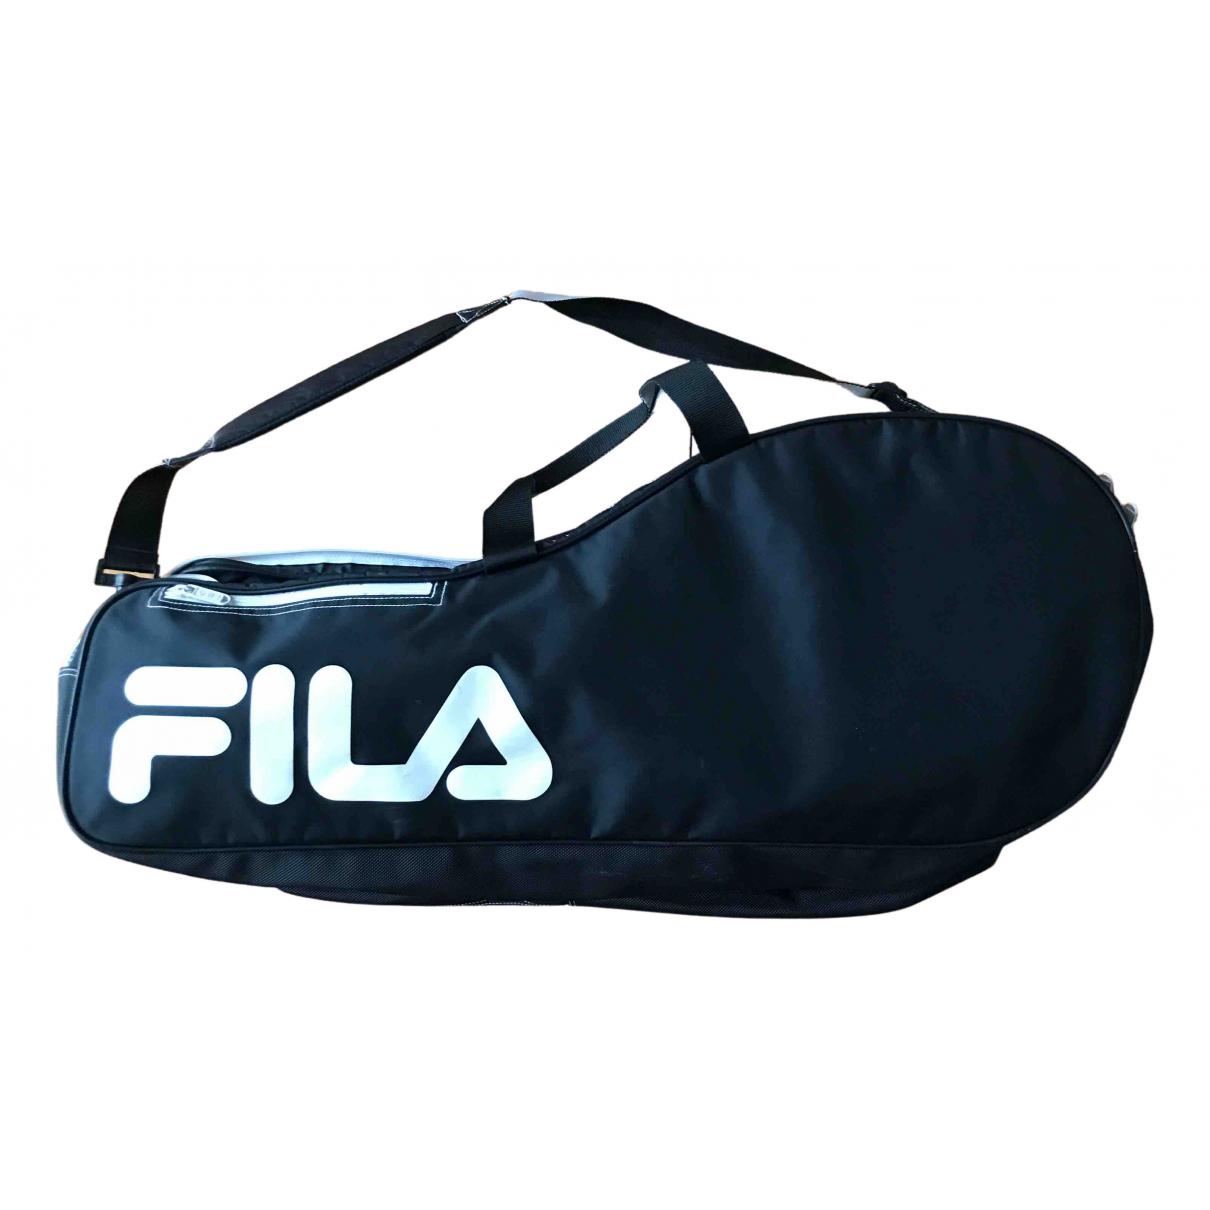 Funda para raquetas Fila